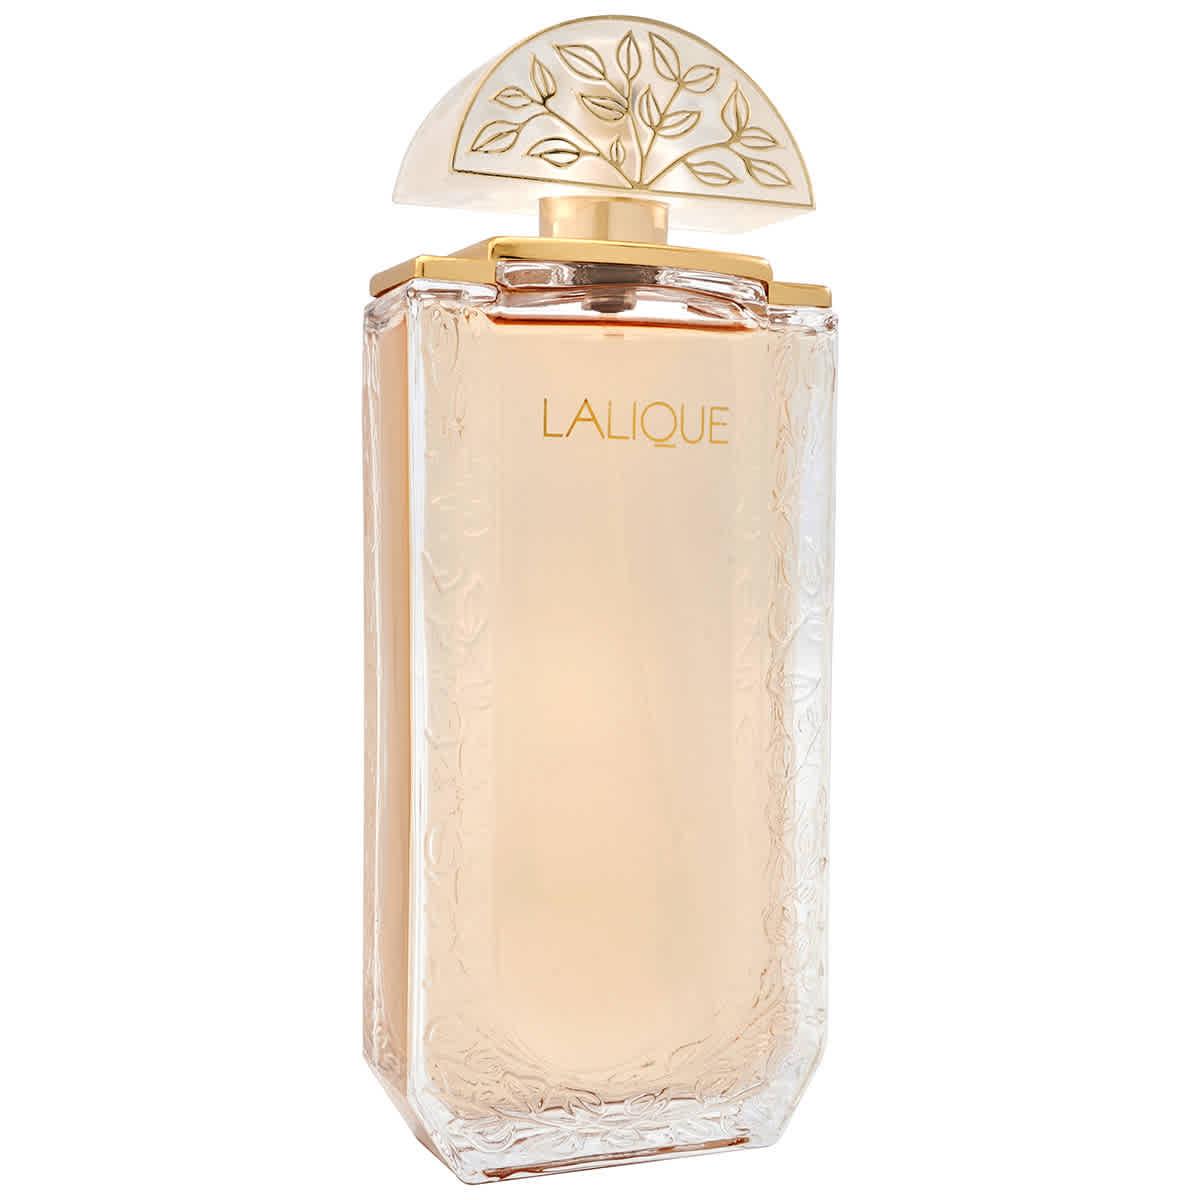 Lalique /  Edp Spray 3.3 oz (w) (100 Ml) In Neutrals